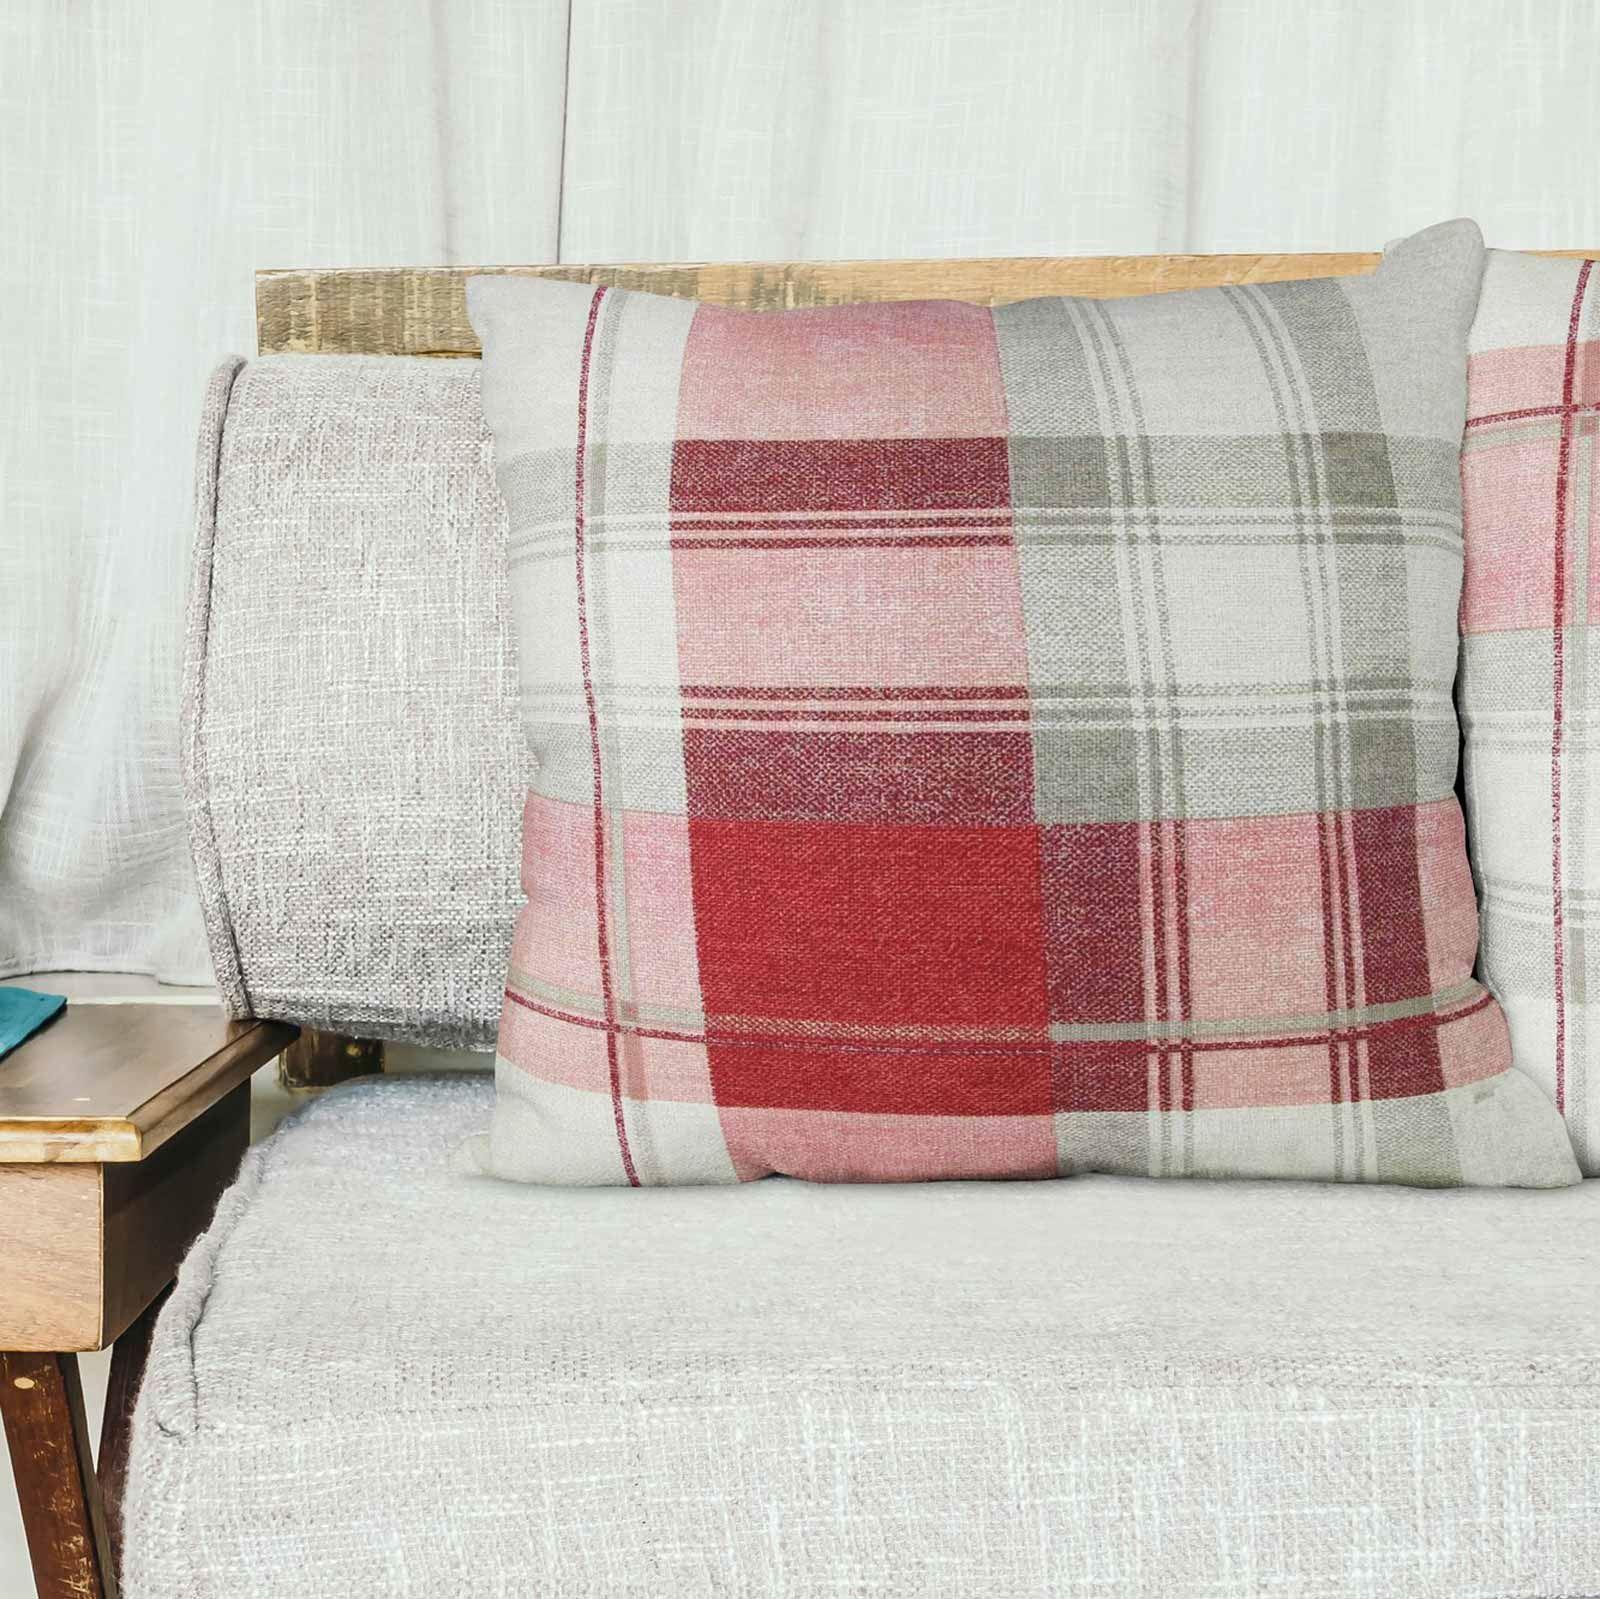 Vino-Tinto-Cushion-Covers-Coleccion-17-034-18-034-43cm-45cm-Cubierta miniatura 41